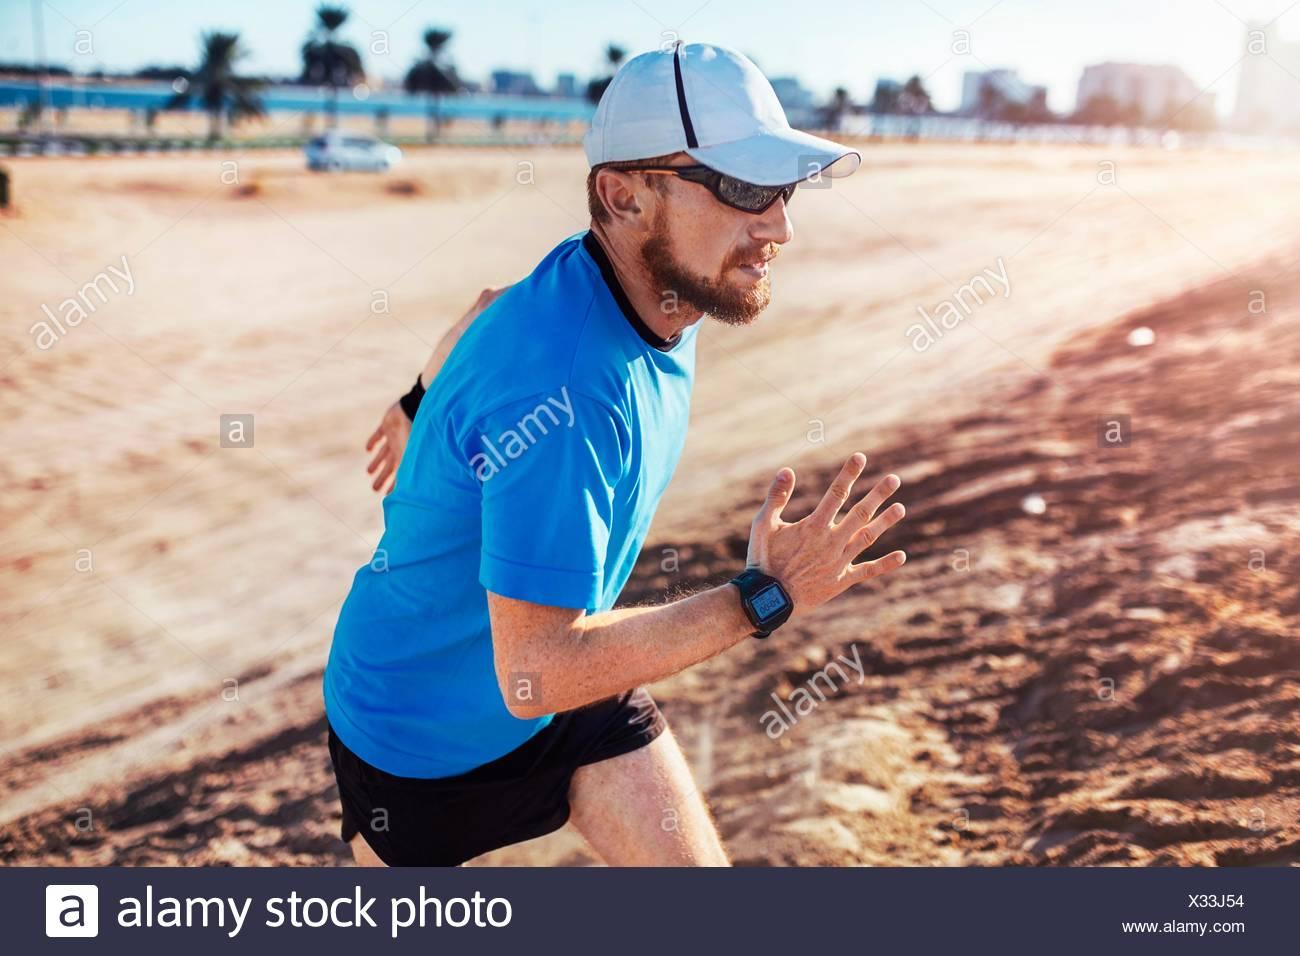 Mid adult man wearing baseball cap running up sand dune, Dubai, United Arab Emirates - Stock Image